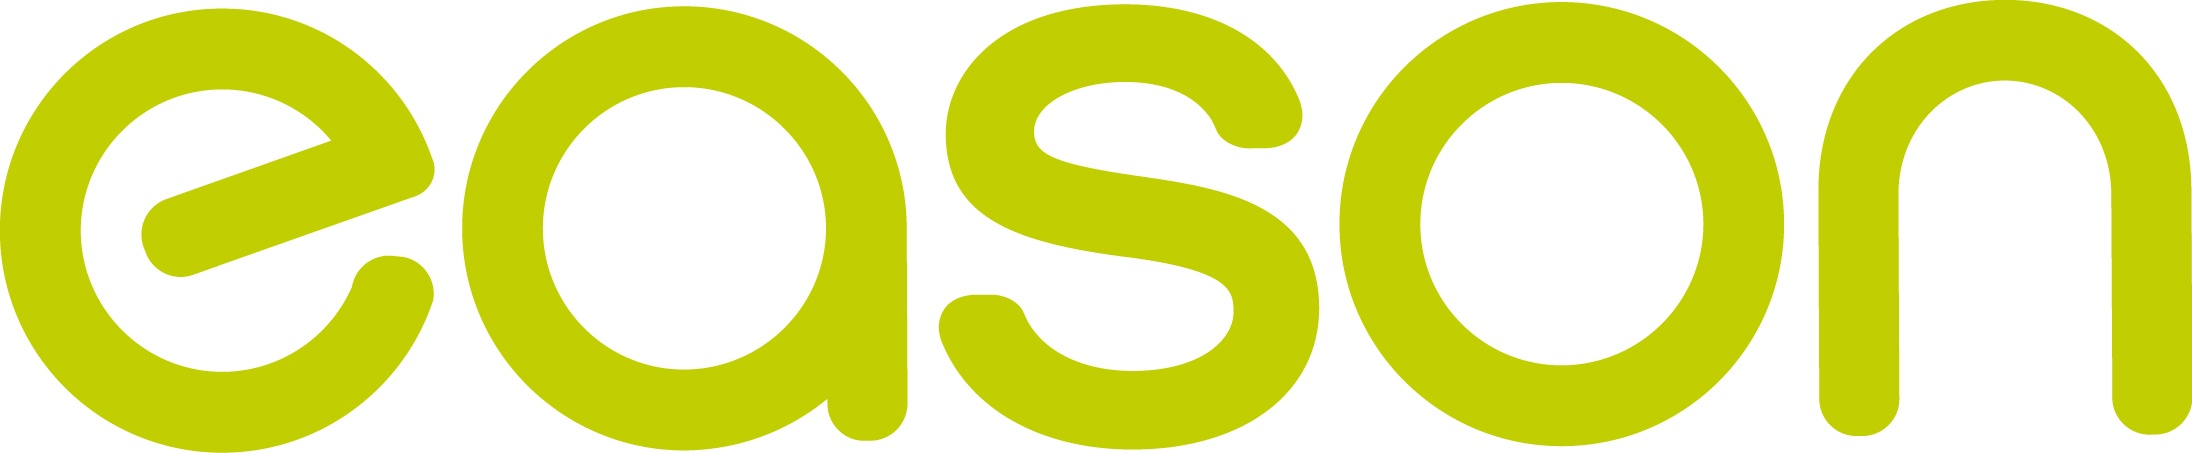 aeson-logo.jpg